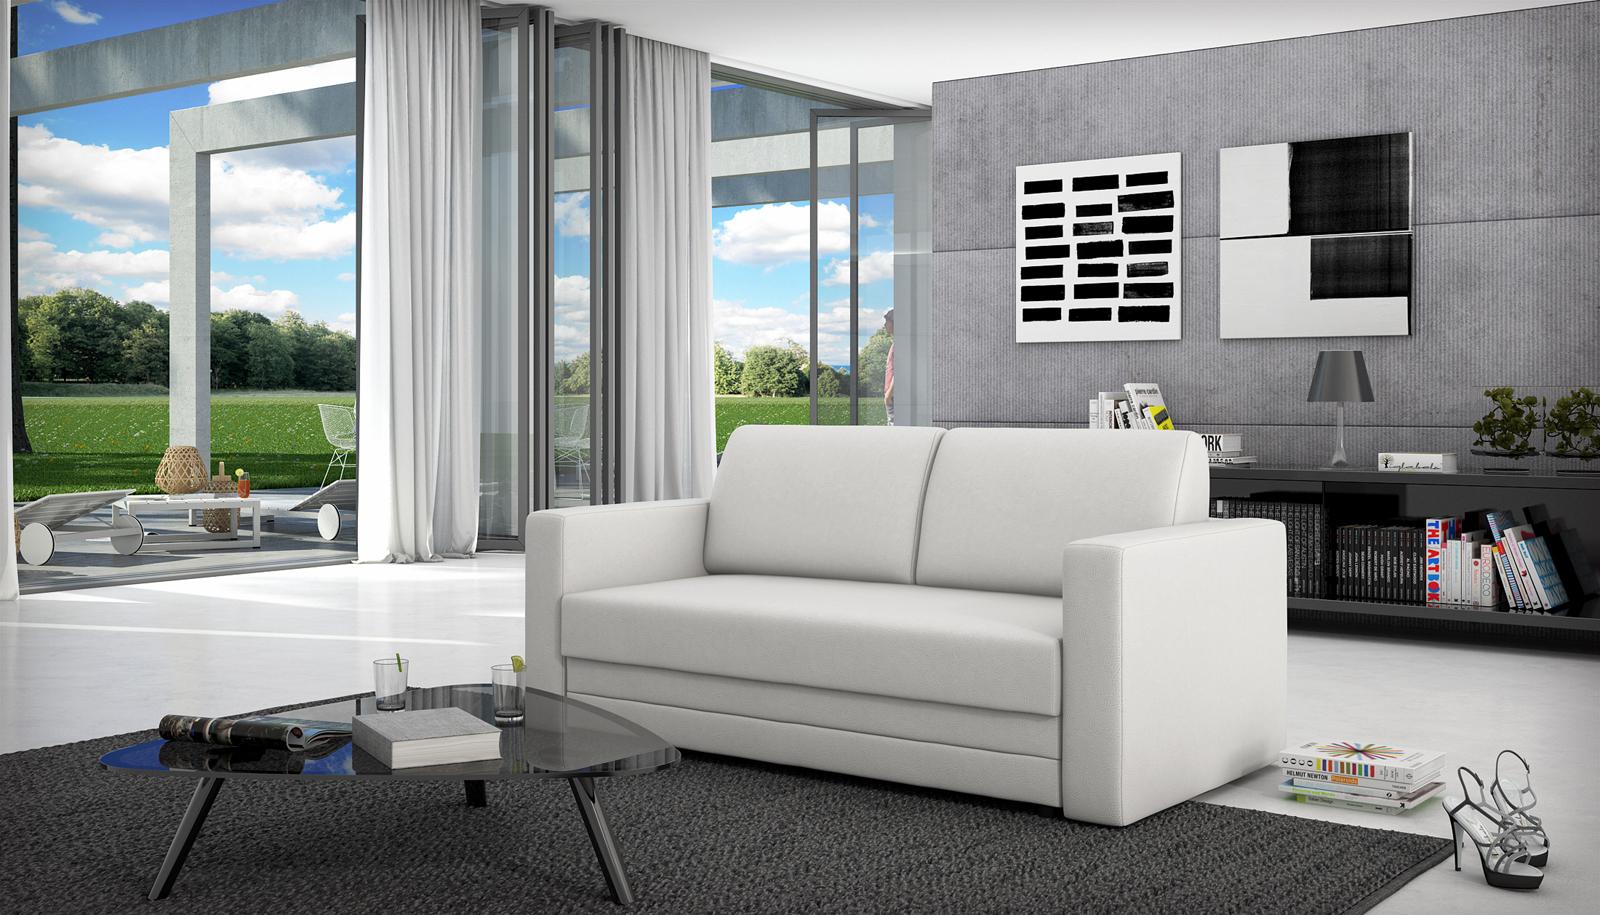 Sam schlafsofa wei sofa carmelita 170 cm bestellware for Schlafcouch auf rechnung